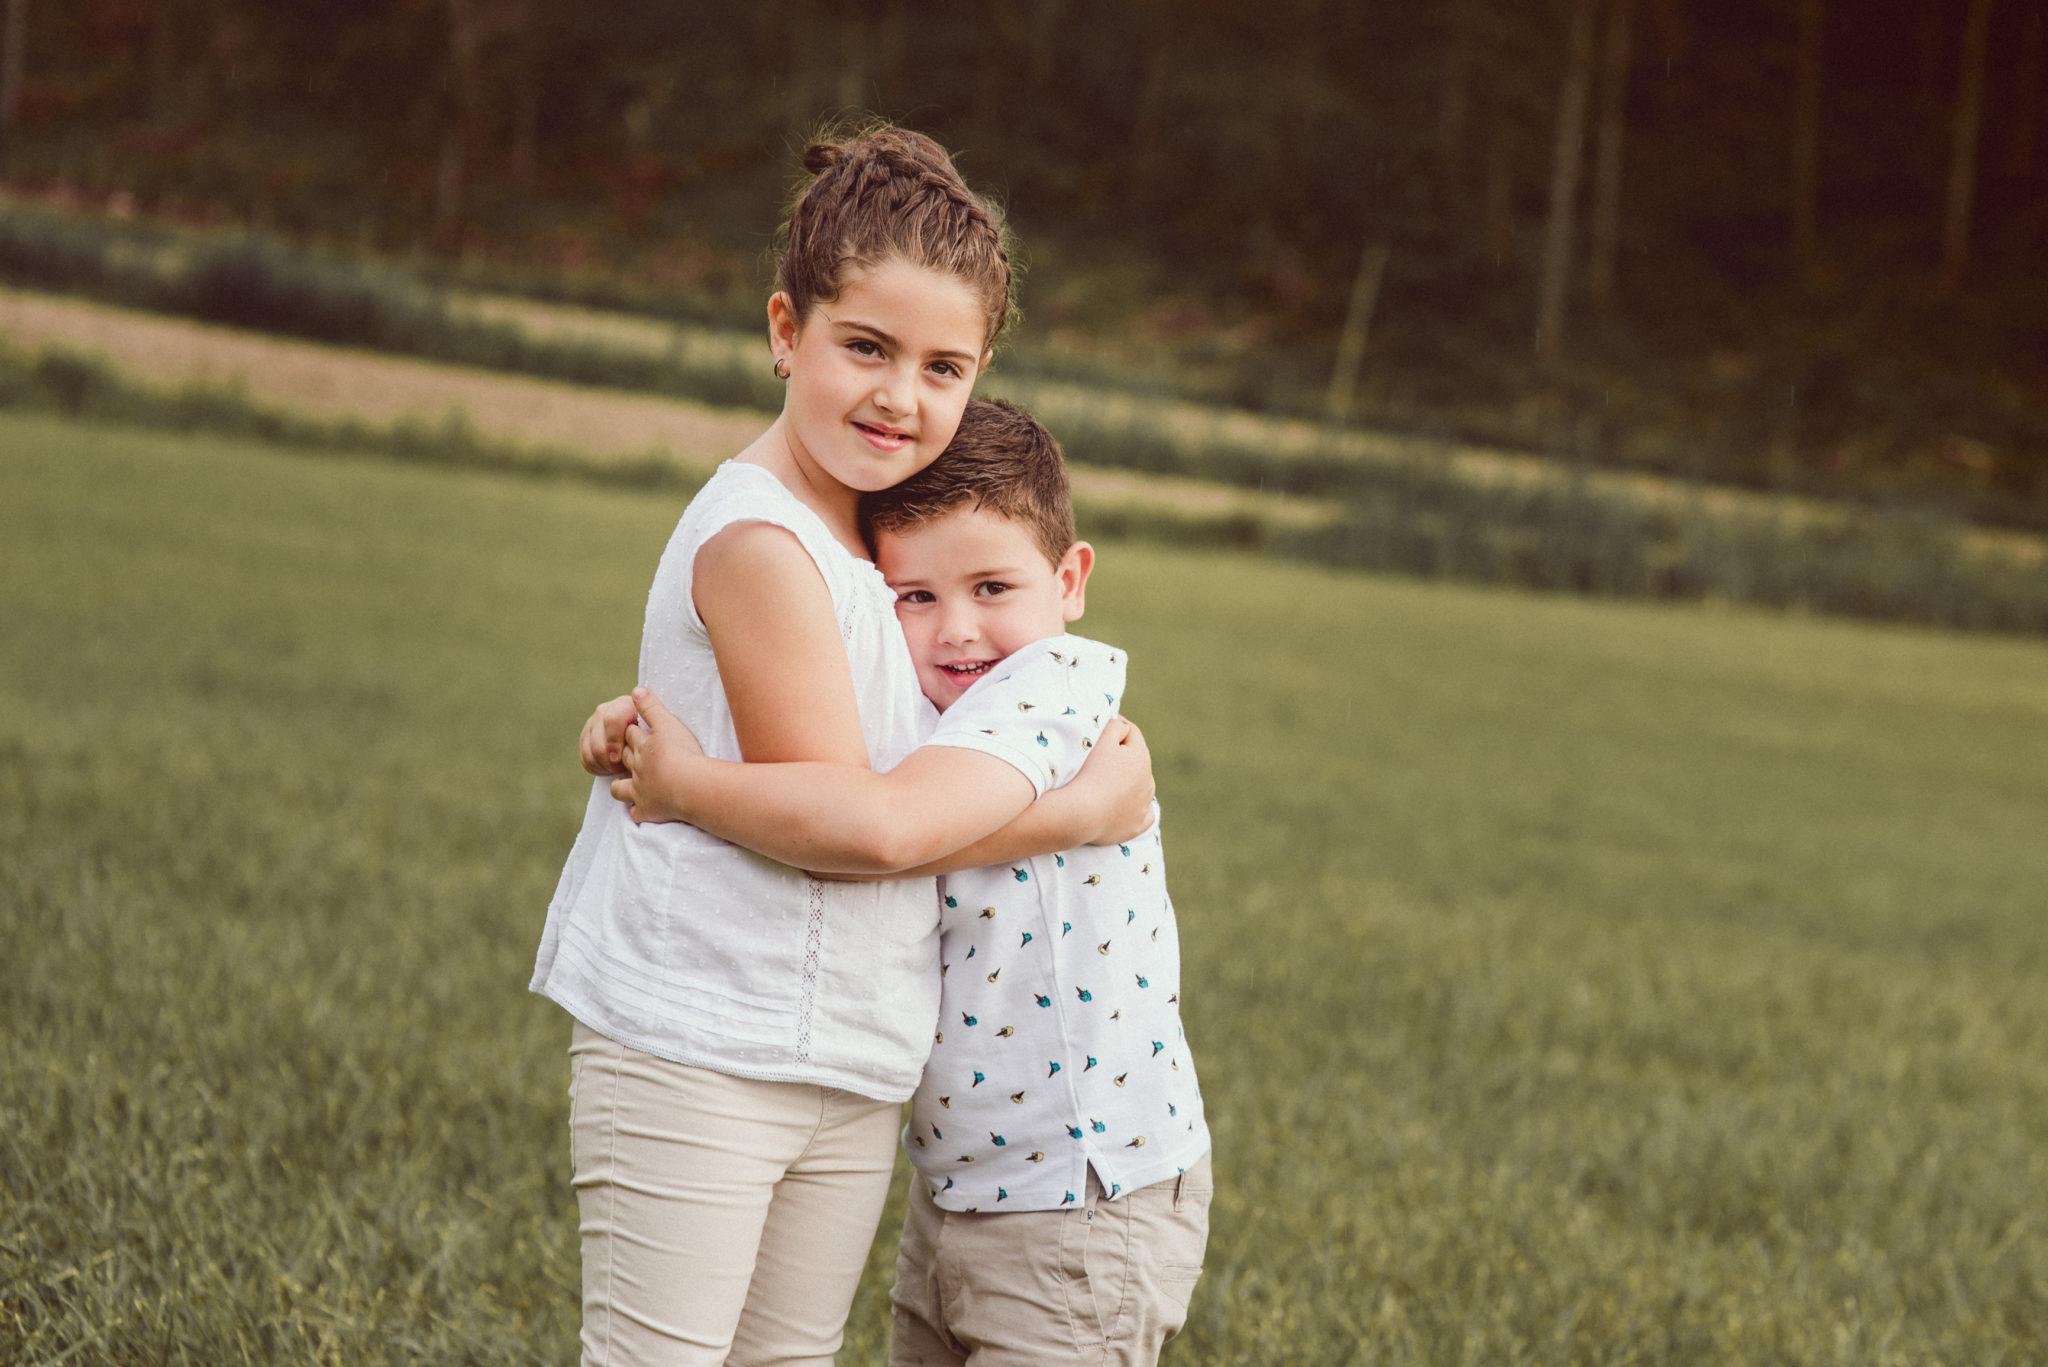 sesion-fotos-bebé-niños-fotografo-reportaje-donosti-gipuzkoa-san-sebastian-zumaia-aizarnazabal